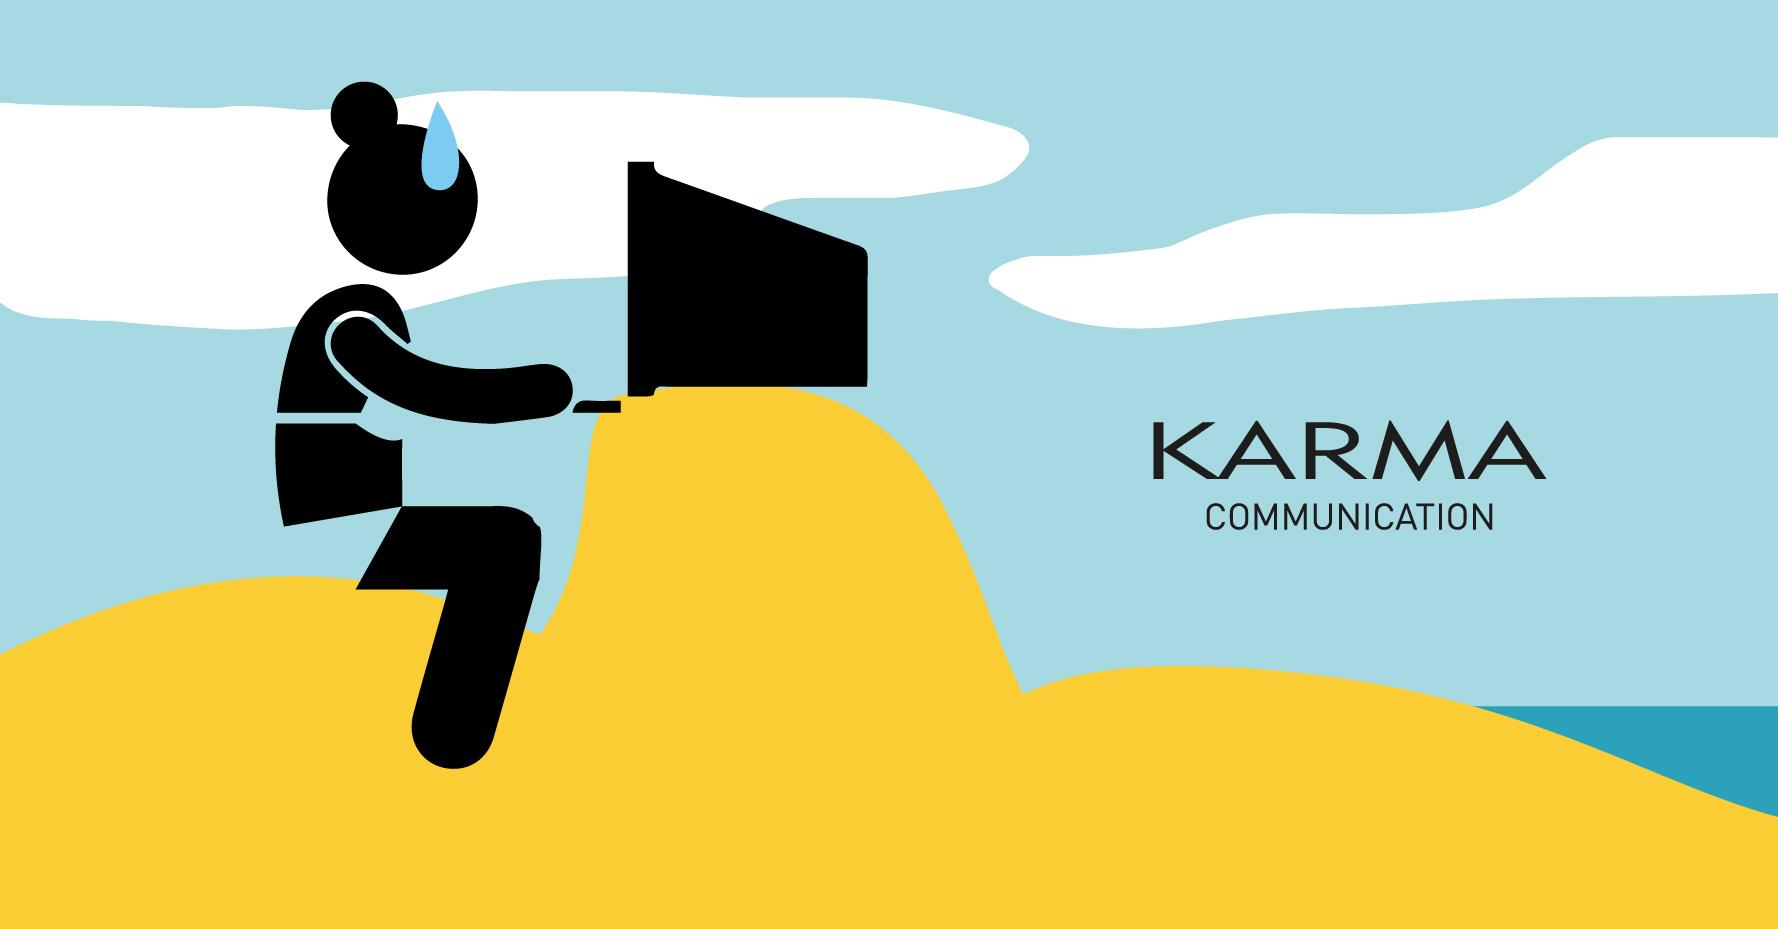 Karma Communication - L'evoluzione di una giornata libera